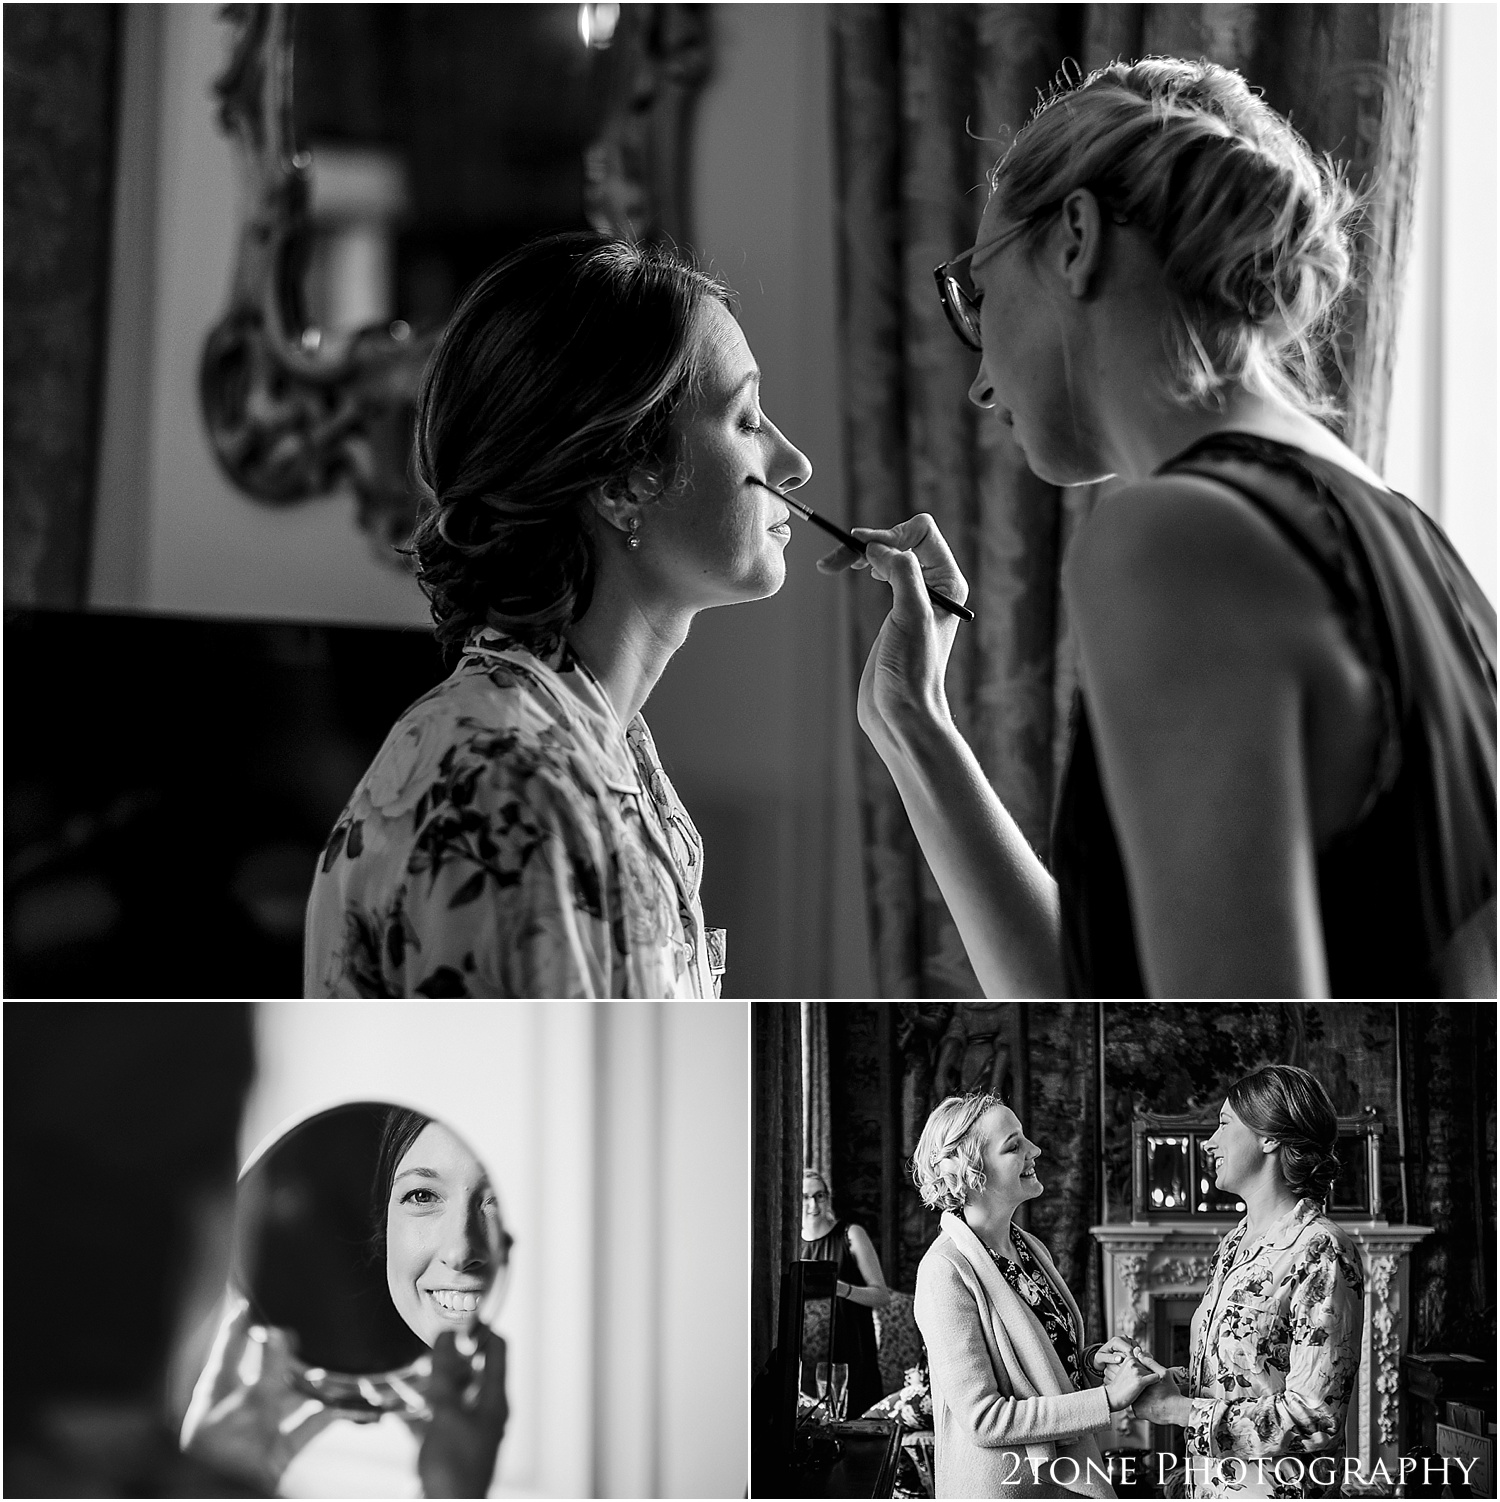 Durham-Castle-wedding-Laura-James 011.jpg